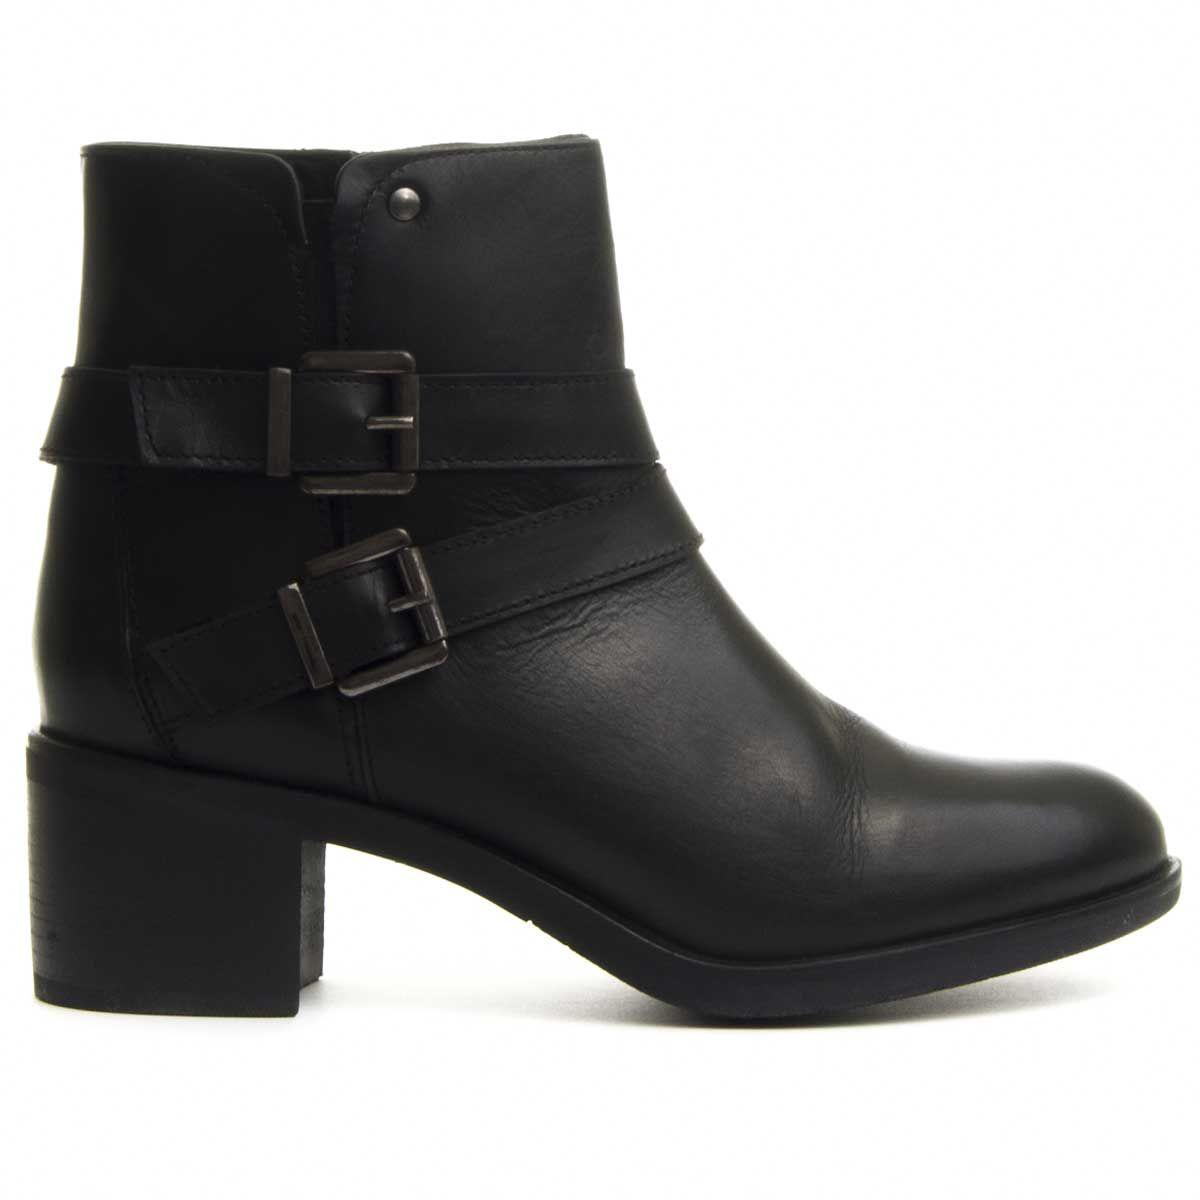 Purapiel Double Buckle Heeled Ankle Boot in Black